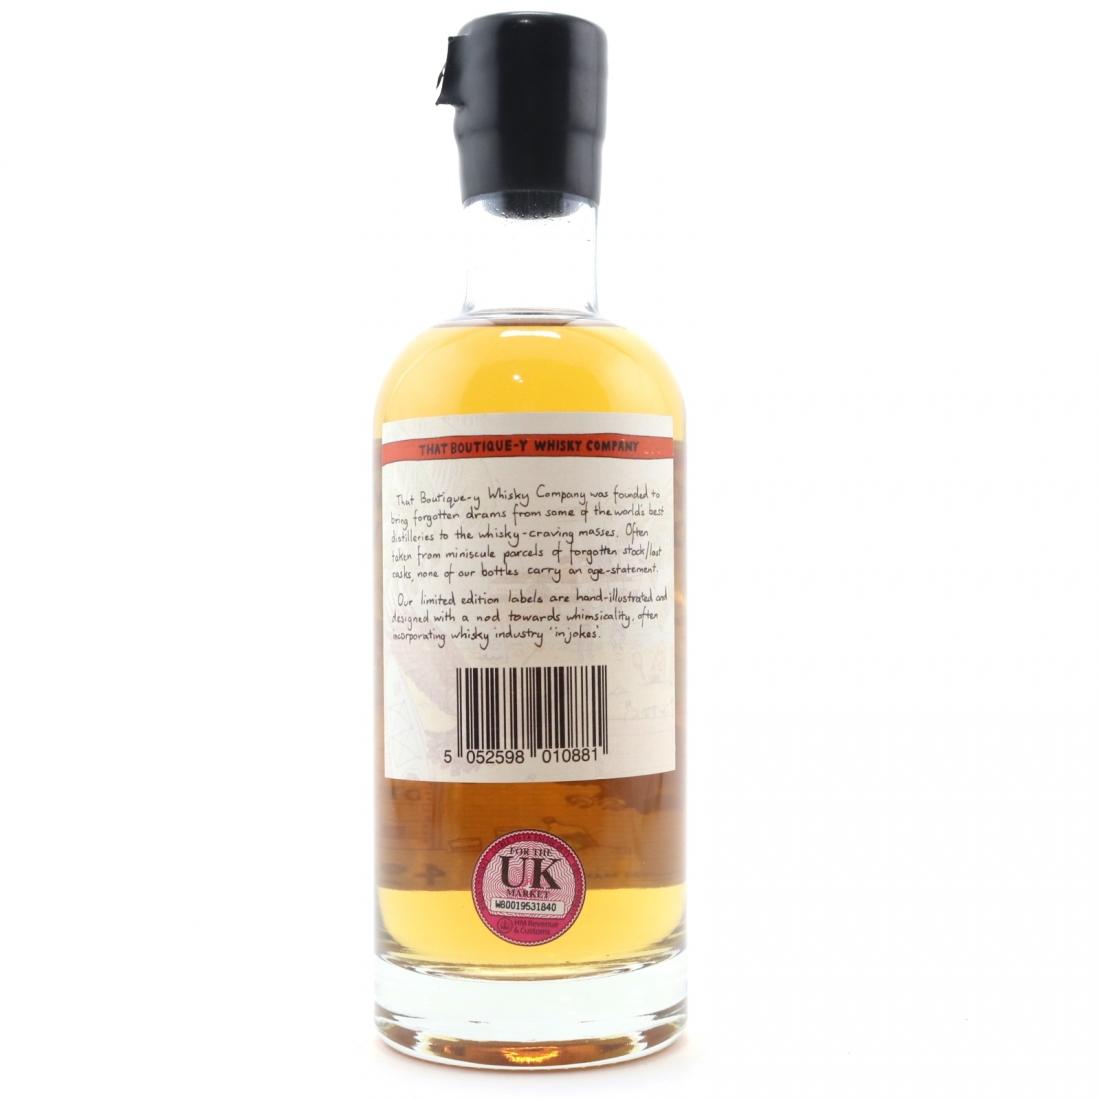 Arran That Boutique-y Whisky Company Batch #1